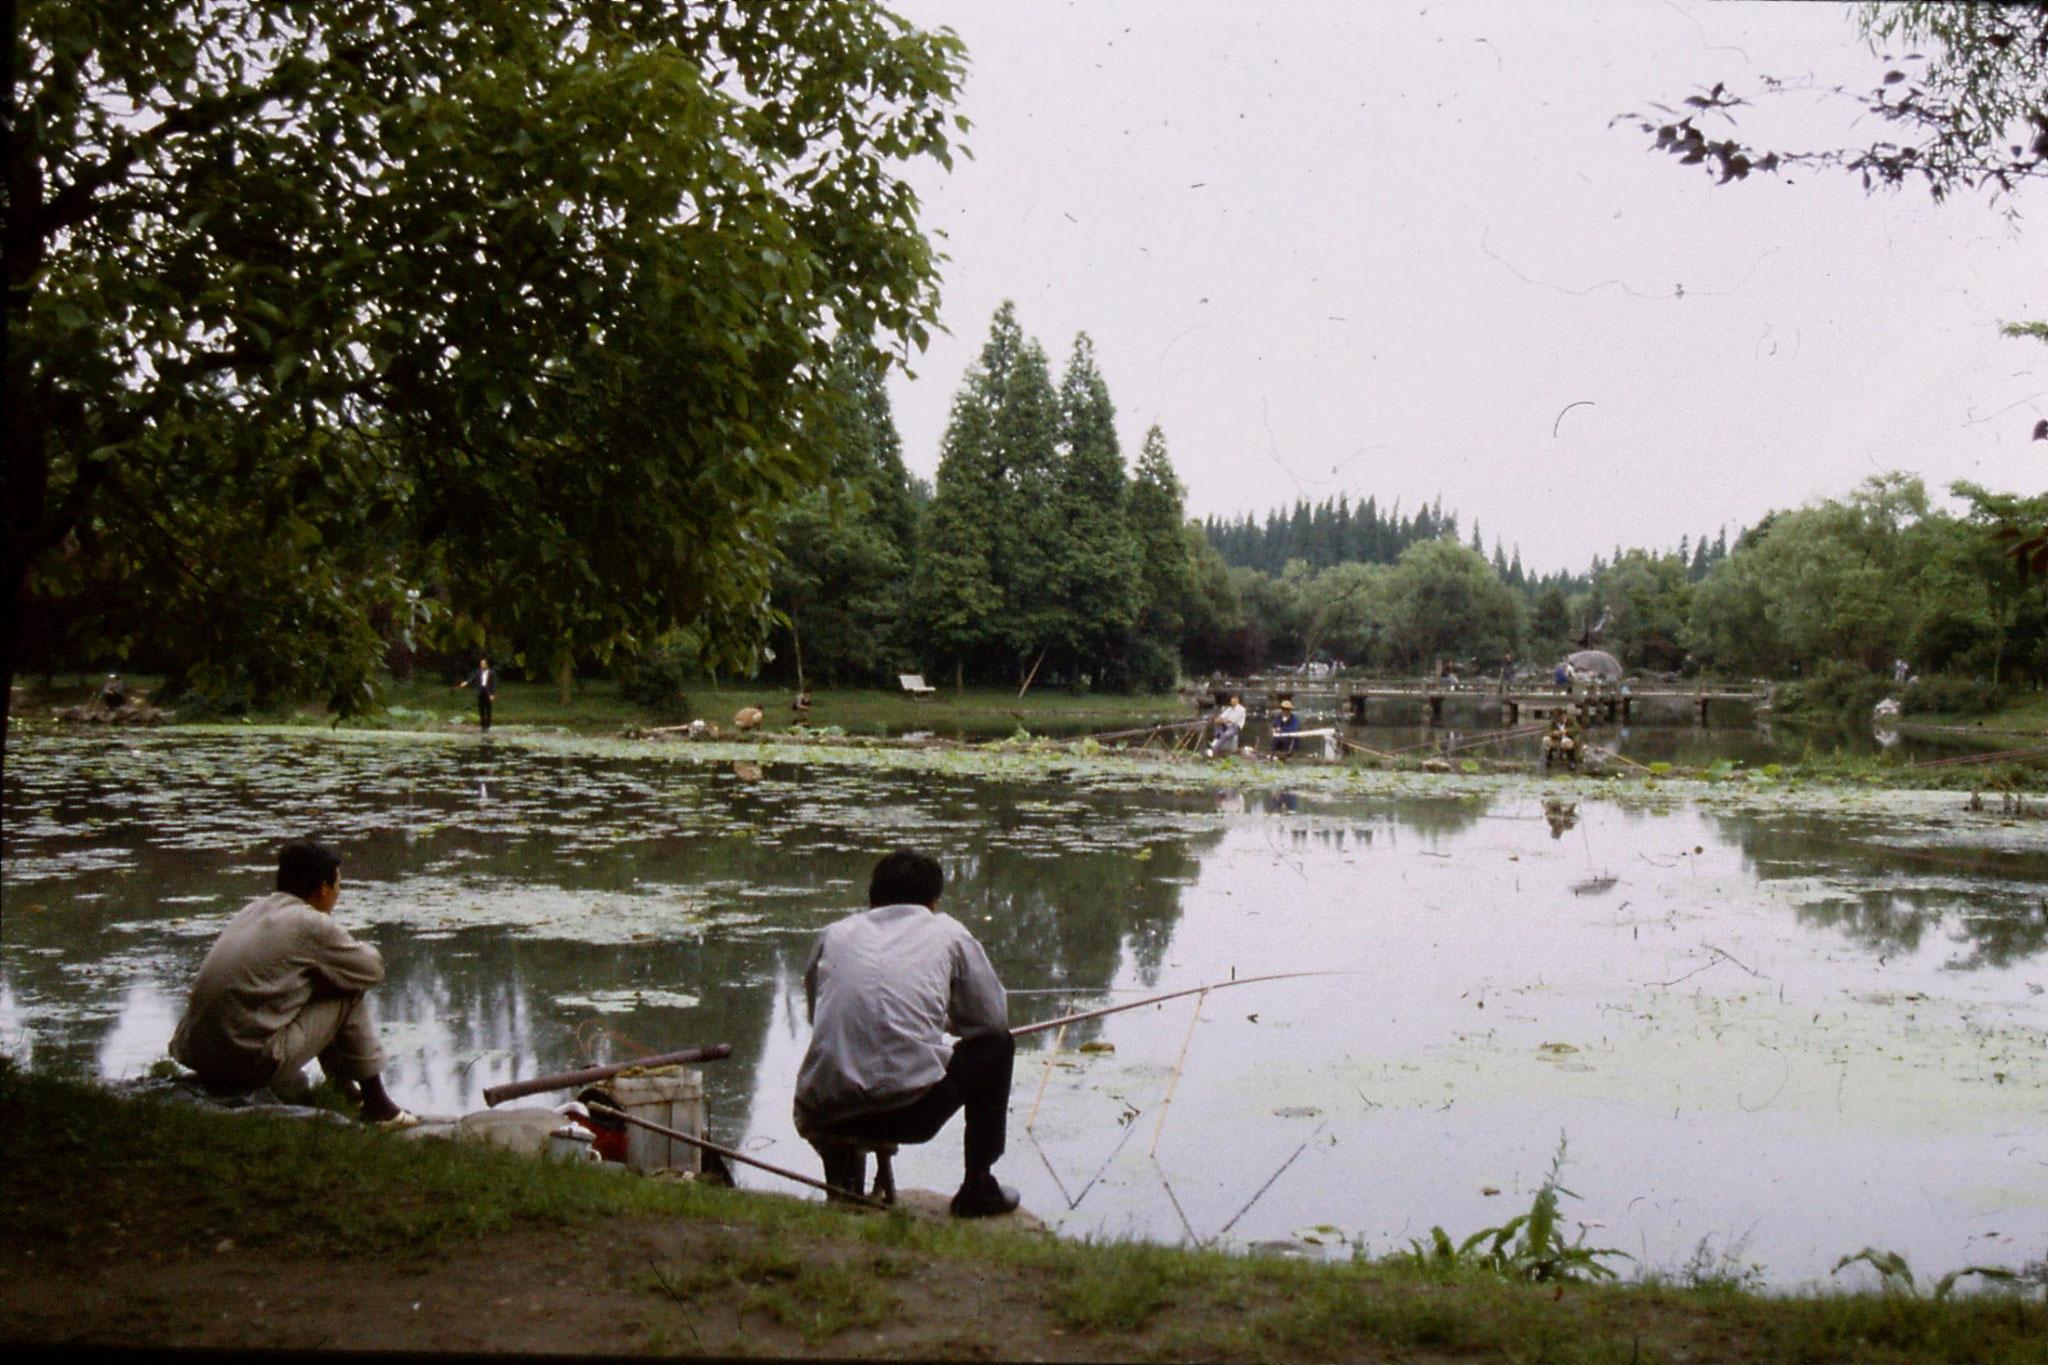 29/5/1989: 27: Yuehu Lake